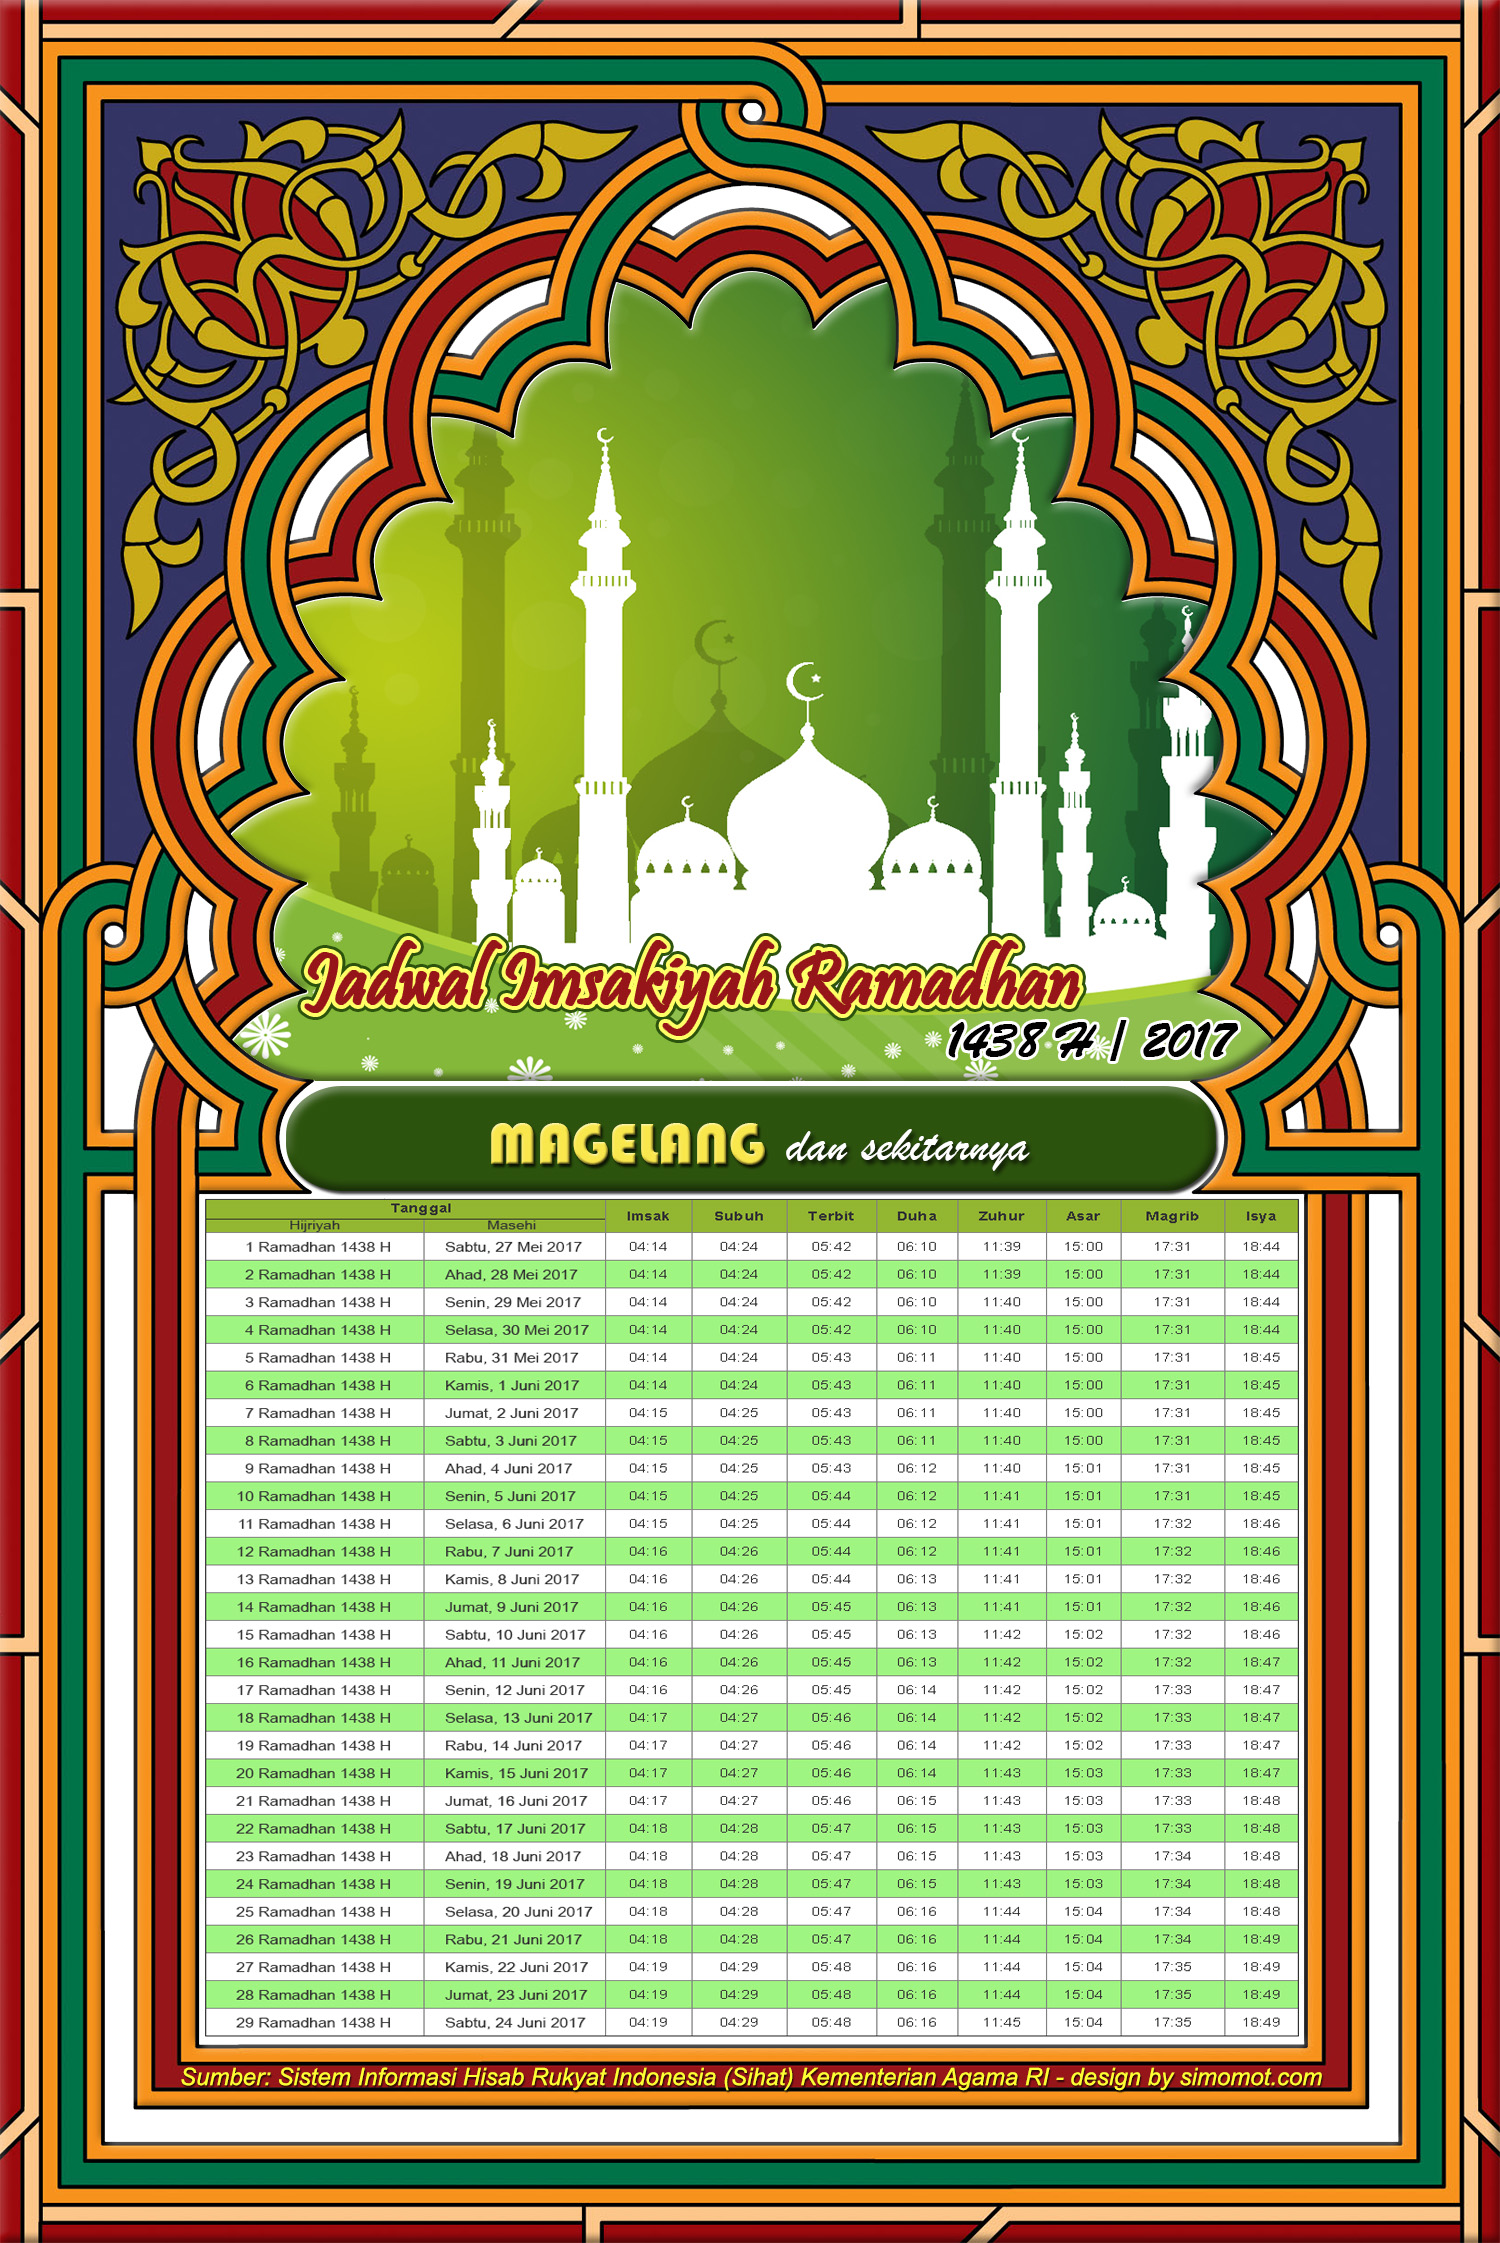 Jadwal Imsakiyah Ramadhan 1438 H - 2017 M seluruh wilayah ...